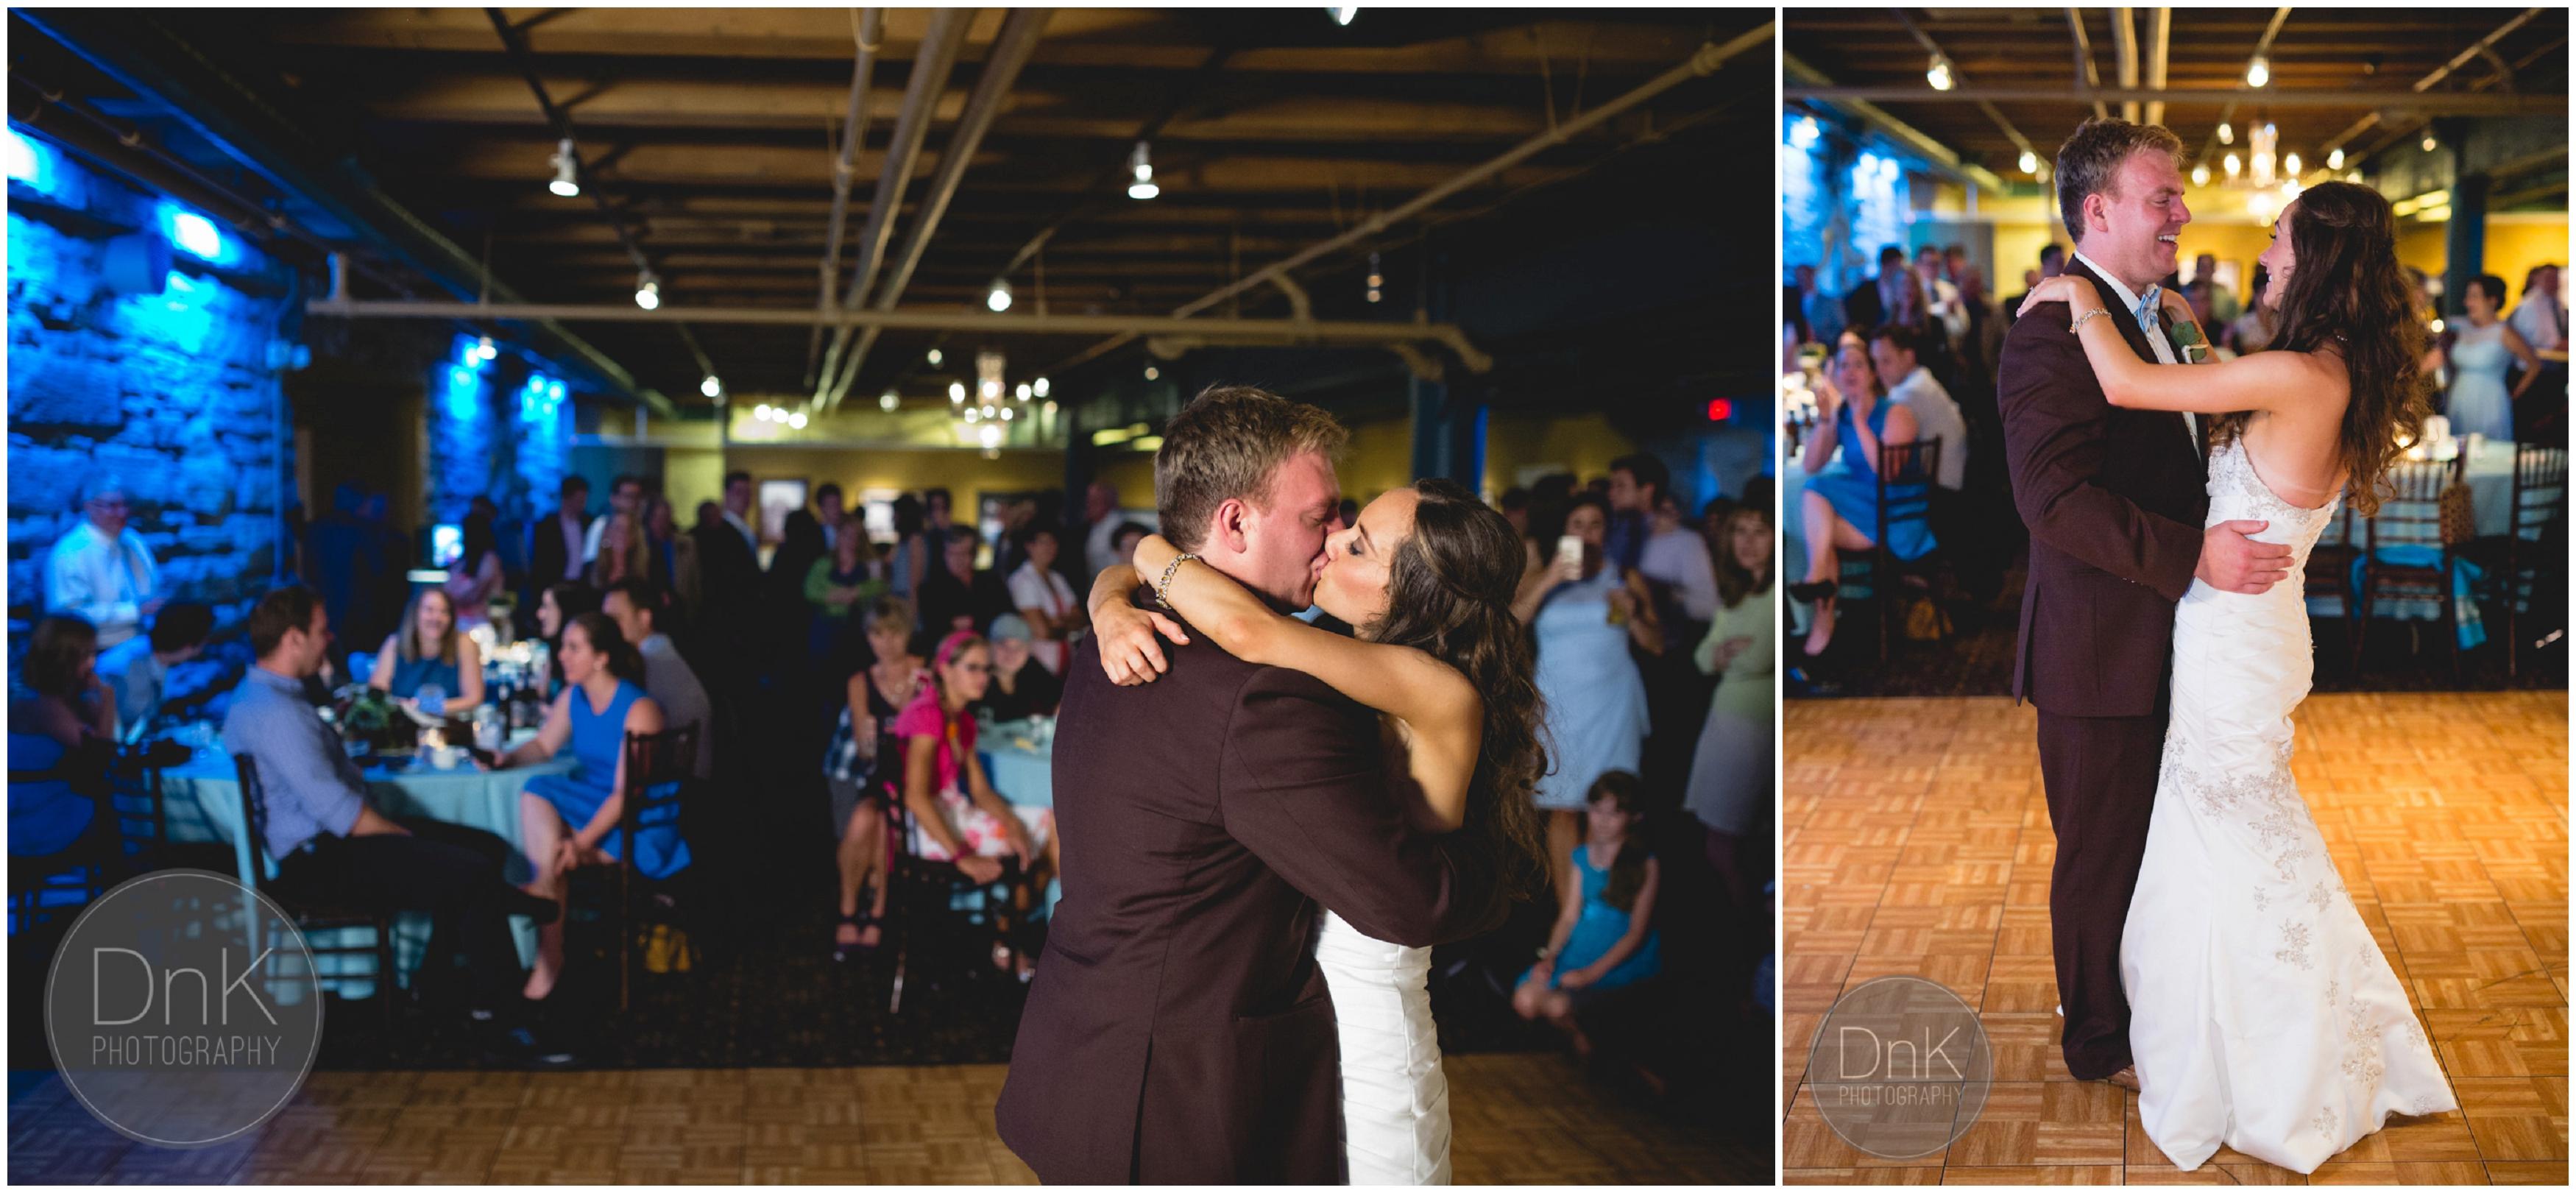 38 - 413 on Wacouta Wedding Reception Dance